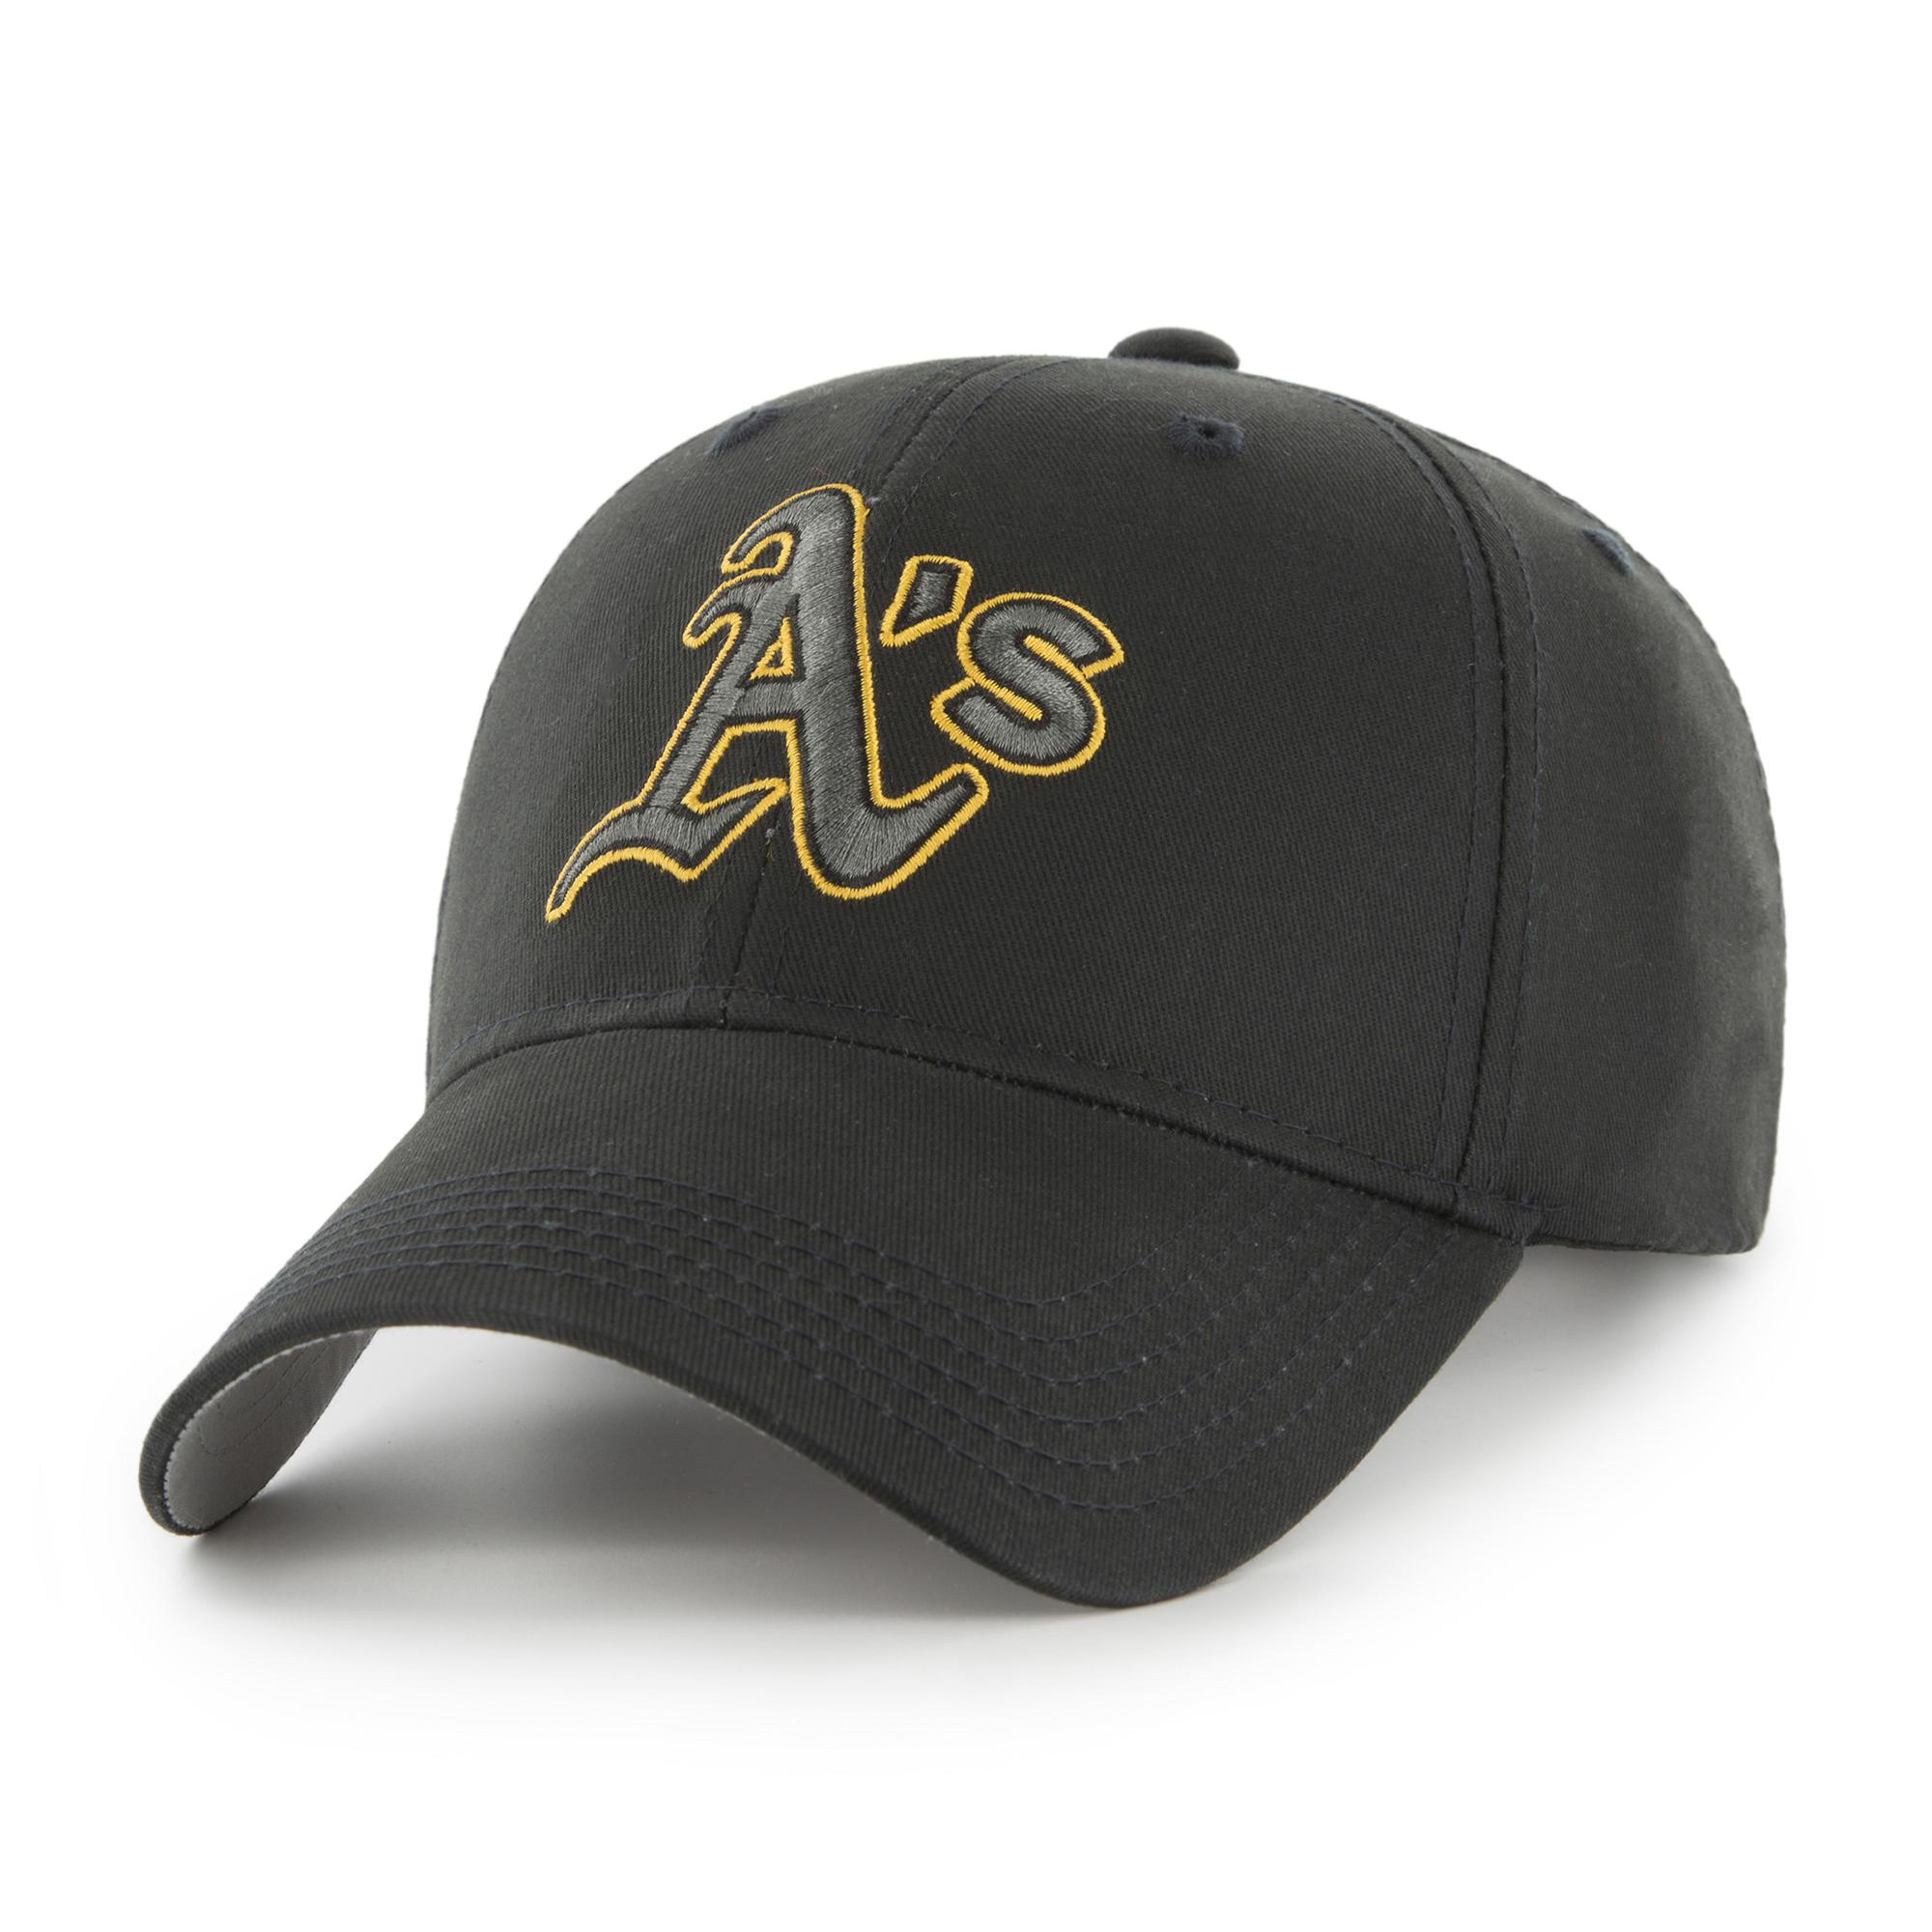 MLB Oakland Athletics Black Mass Basic Adjustable Cap/Hat by Fan Favorite